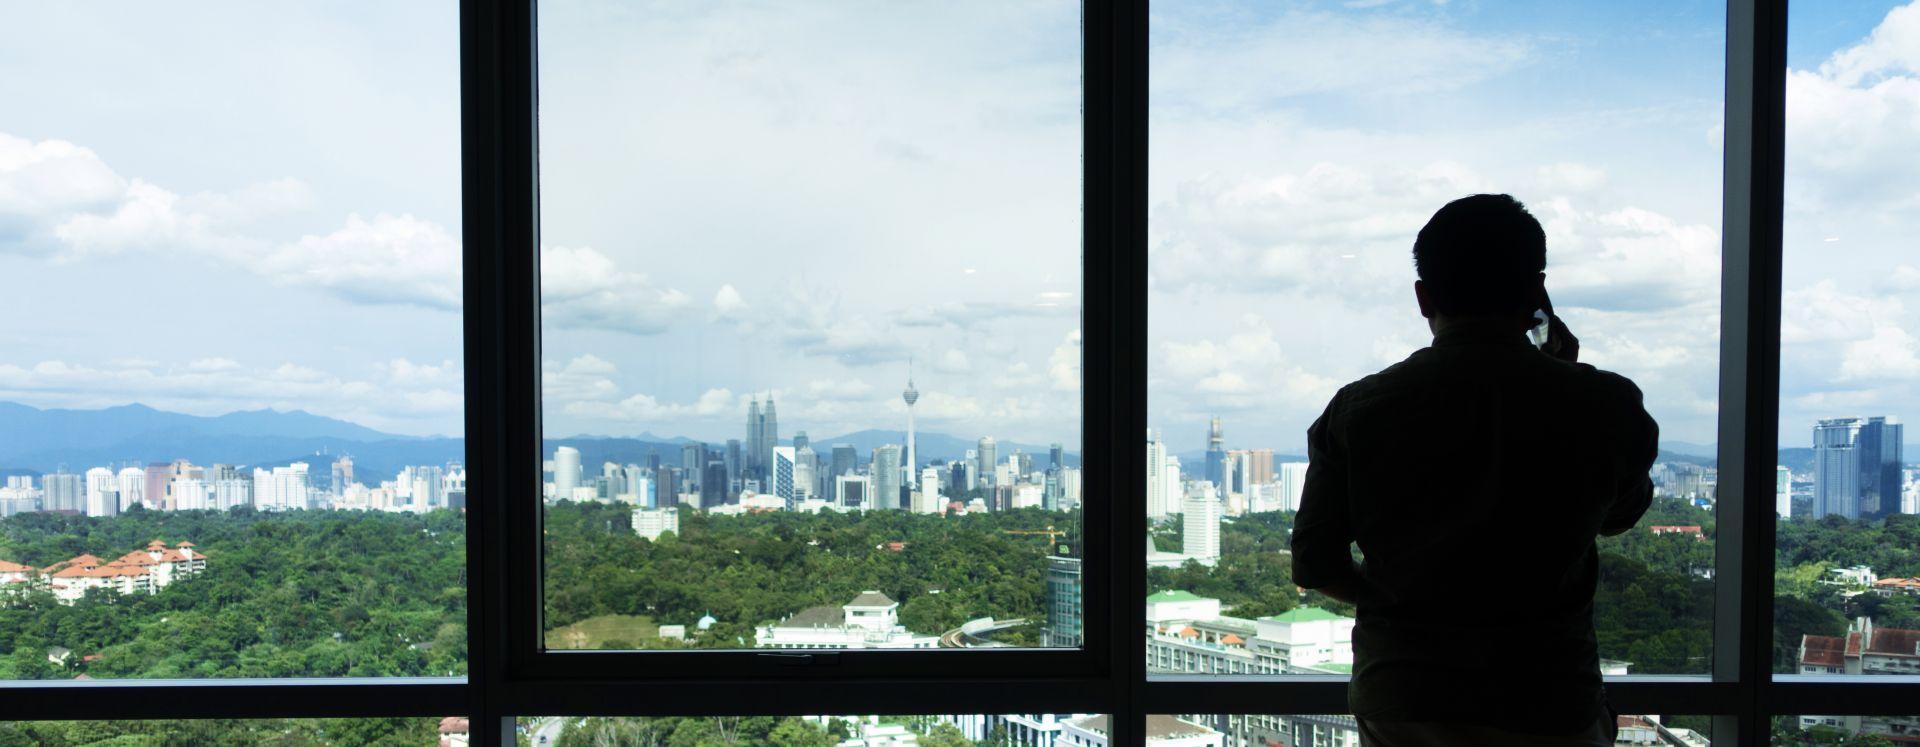 Common Ground, Damansara Heights, Kuala Lumpur